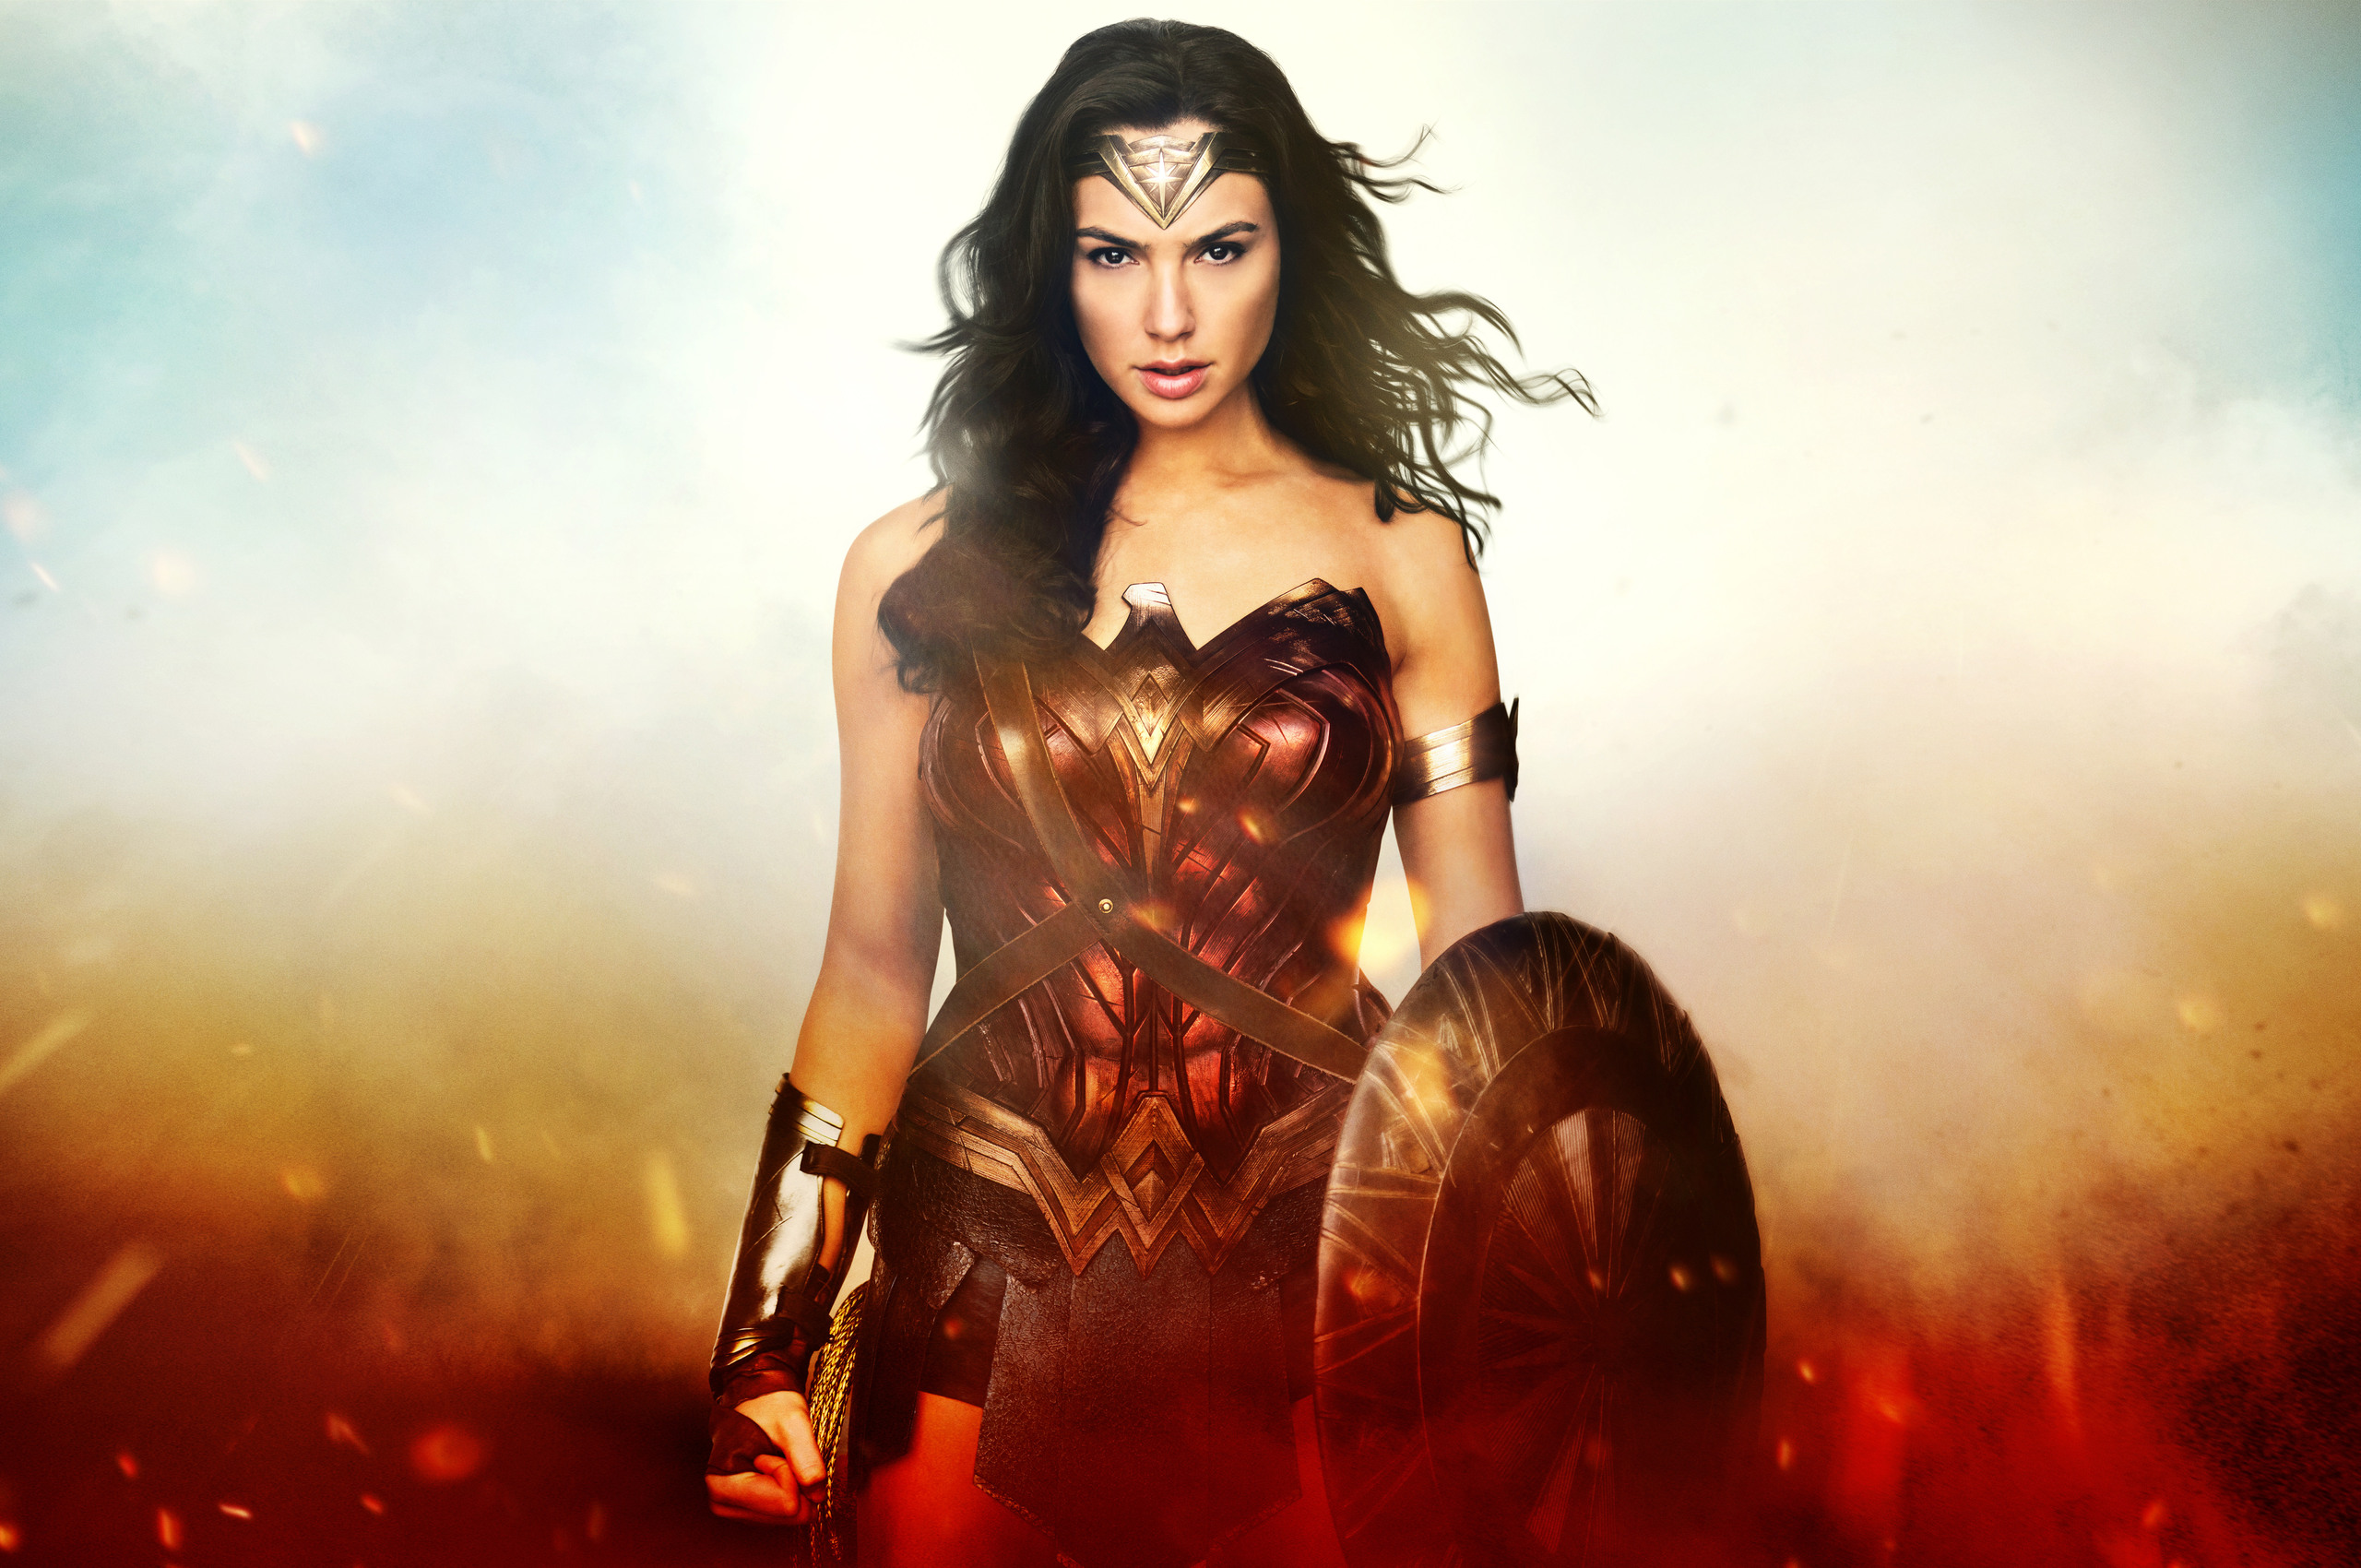 wonder-woman-knight-12k-bv.jpg